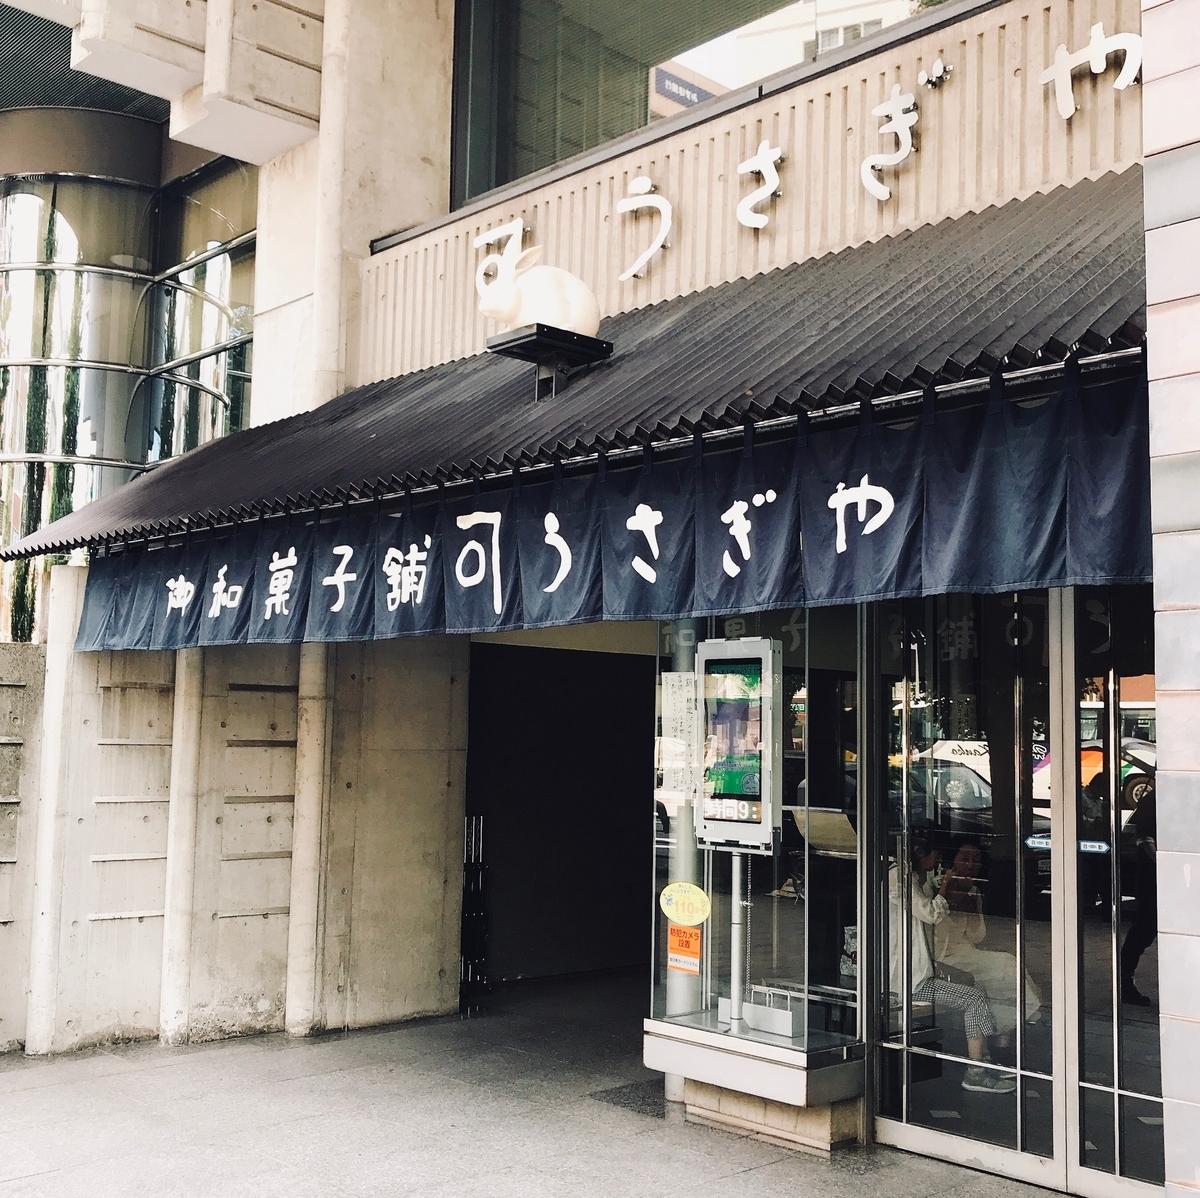 f:id:shufukatsu:20190914235750j:plain